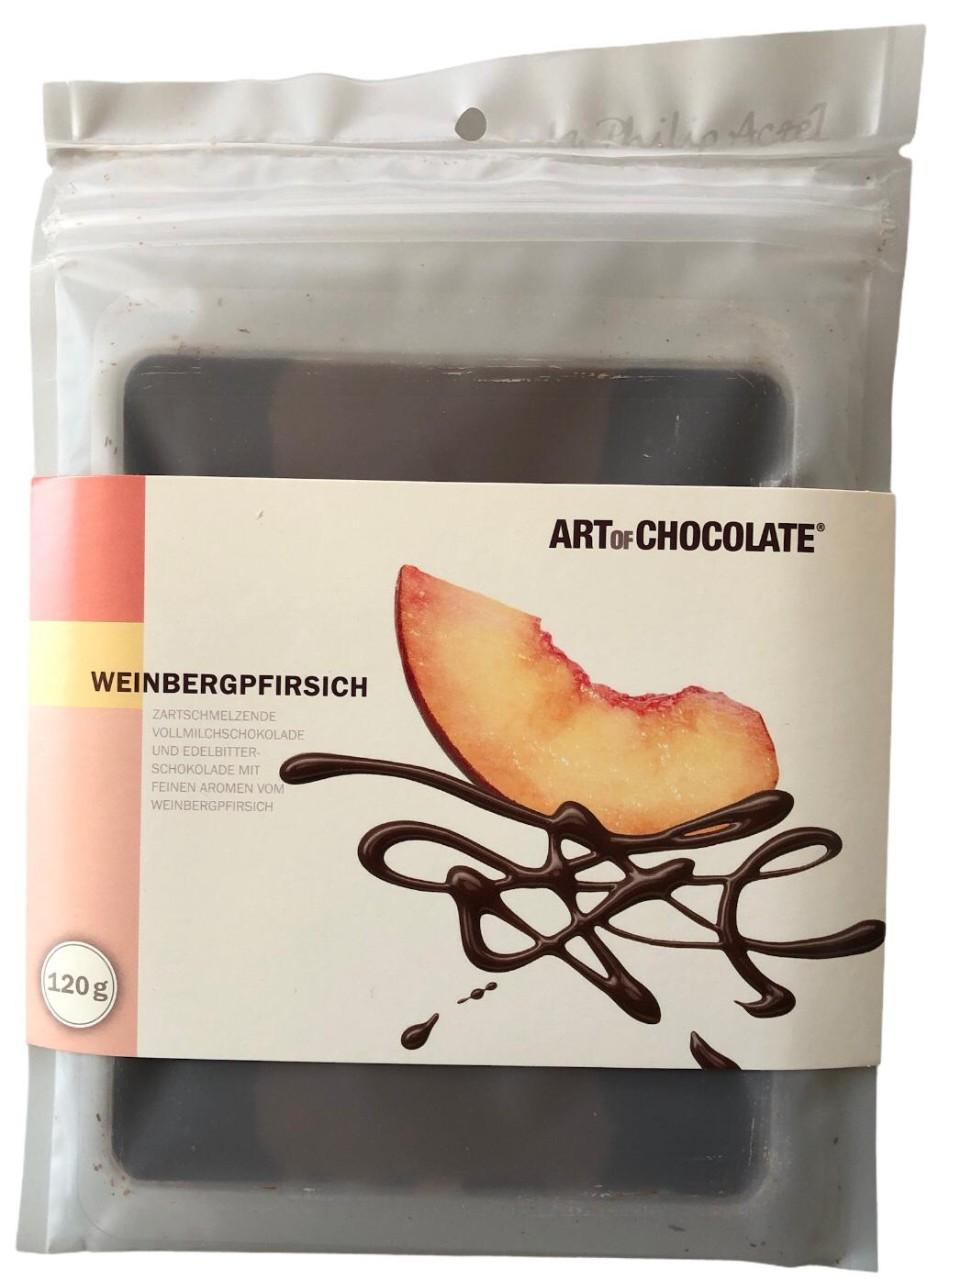 Art of Chocolate Weinbergpfirsich 120g